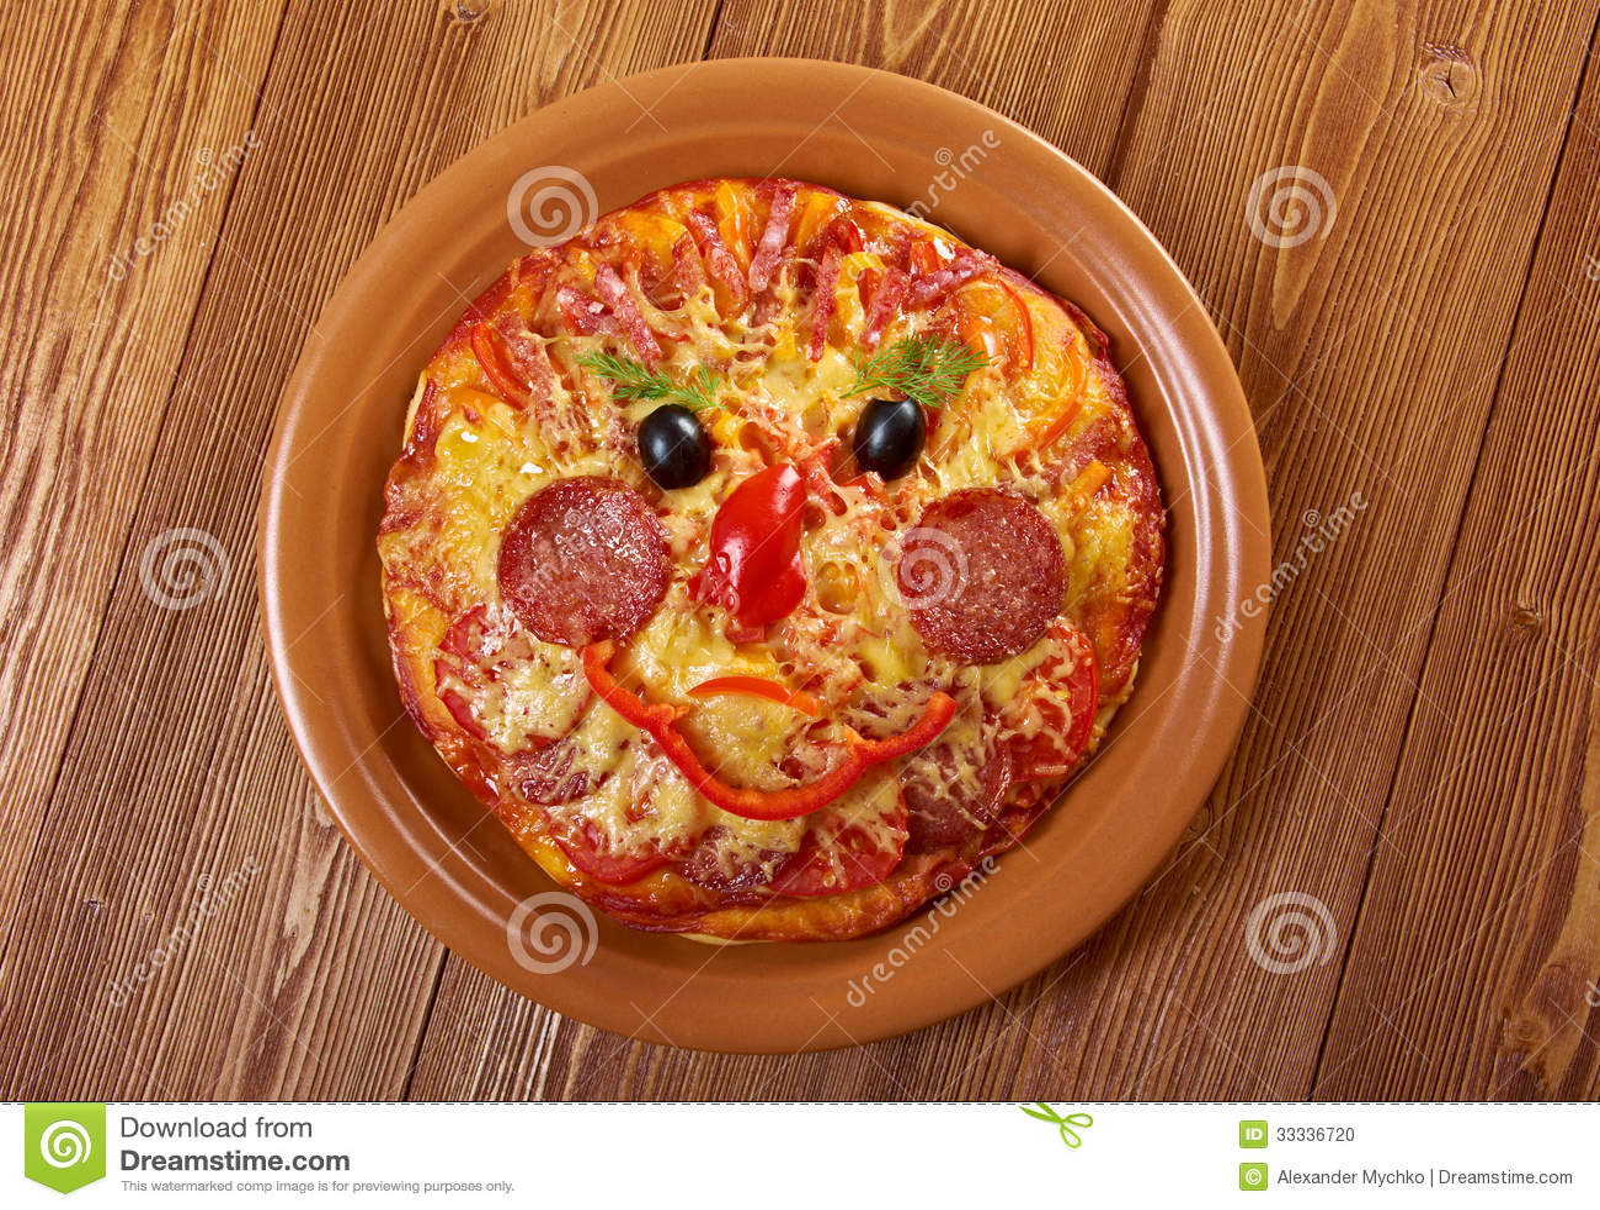 smiley faced pizza stockfoto bild 33336720. Black Bedroom Furniture Sets. Home Design Ideas